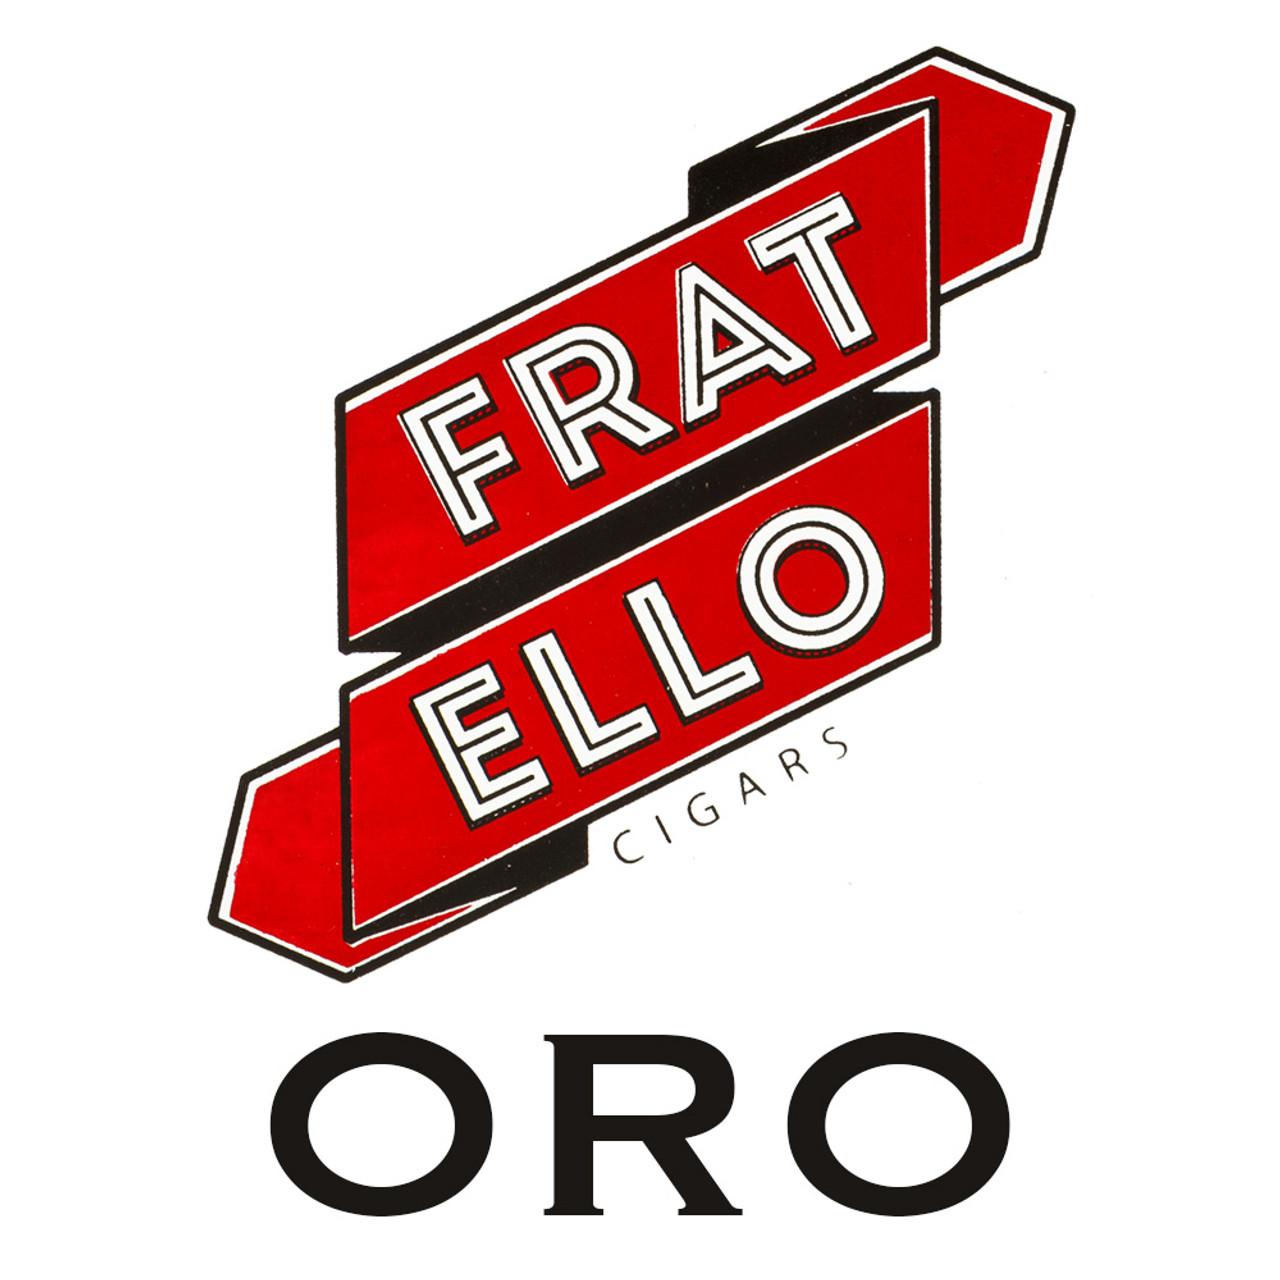 Fratello Oro Corona Cigars - 5.5 x 45 (Box of 20)